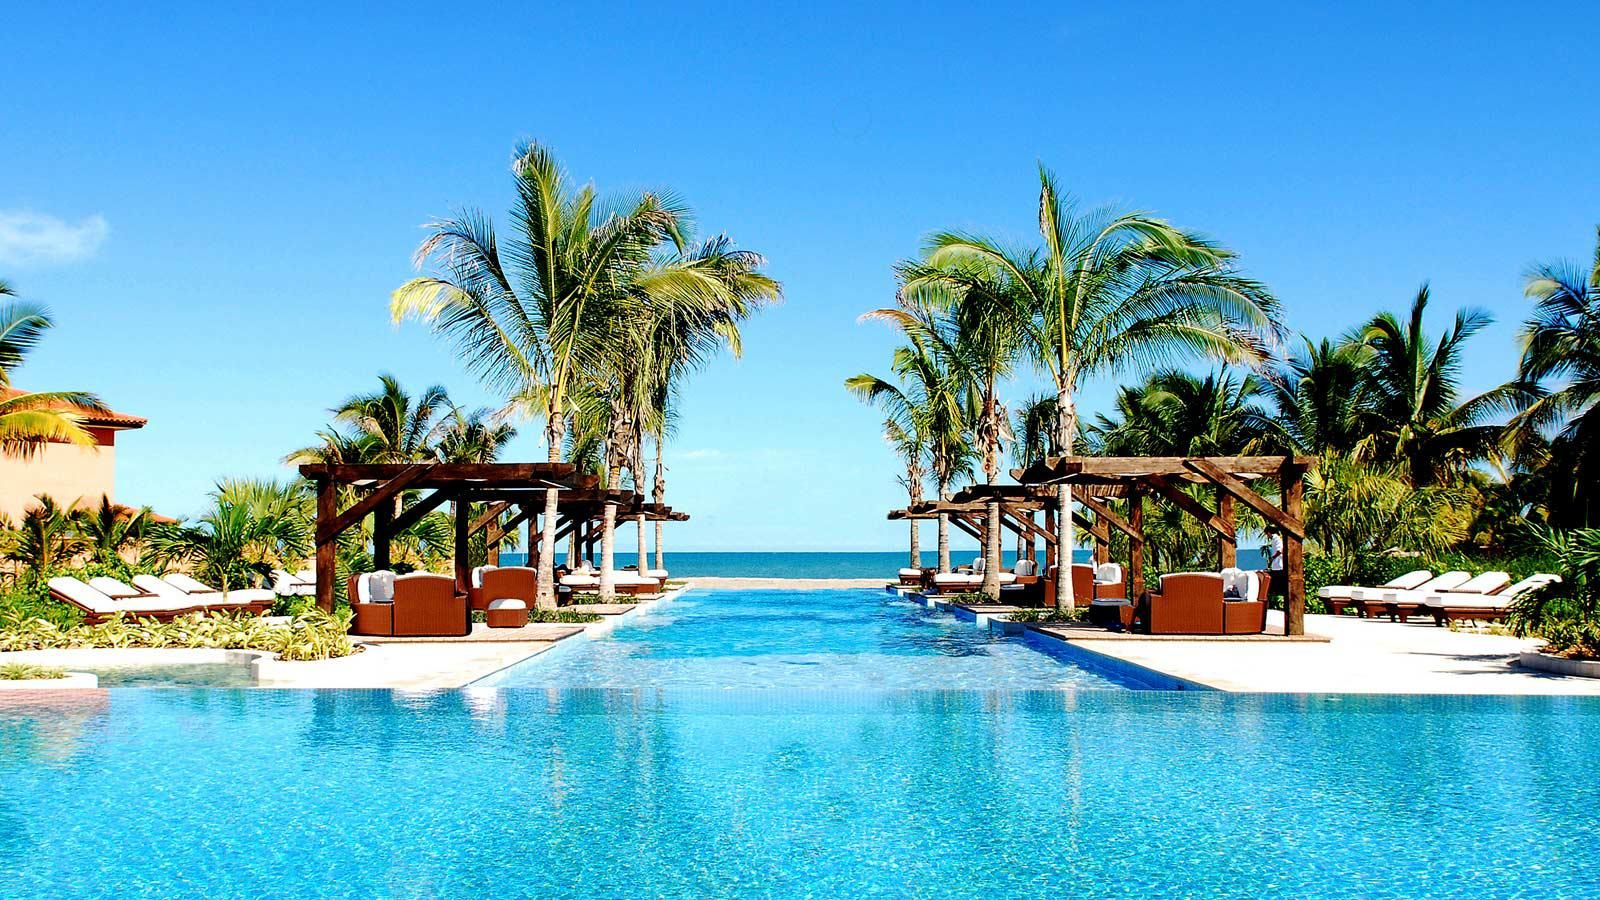 Jw Marriott Panama Golf Beach Resort